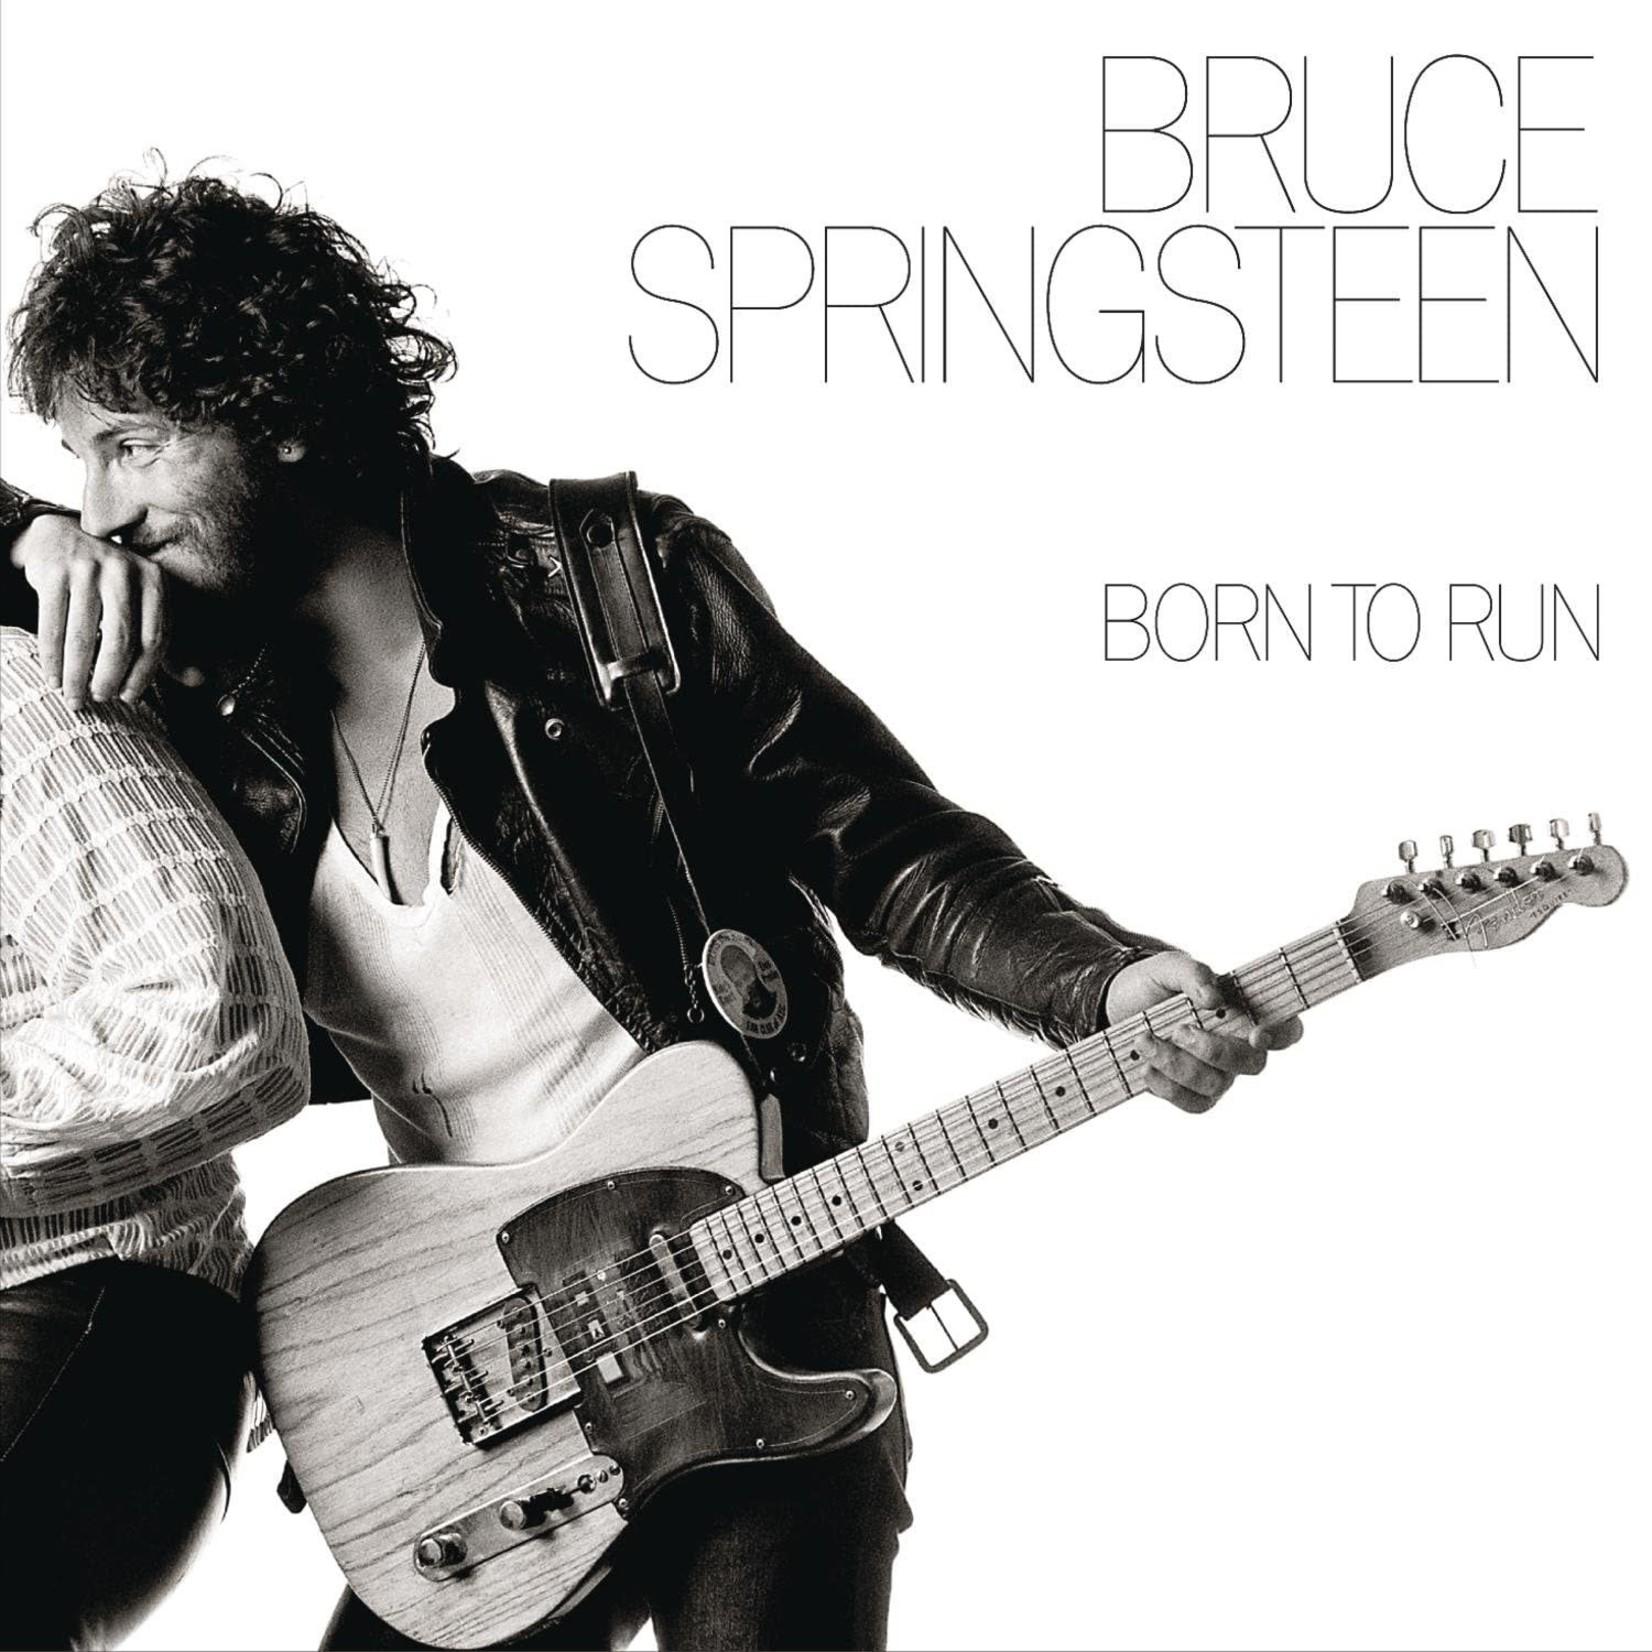 [Vintage] Springsteen, Bruce: Born to Run